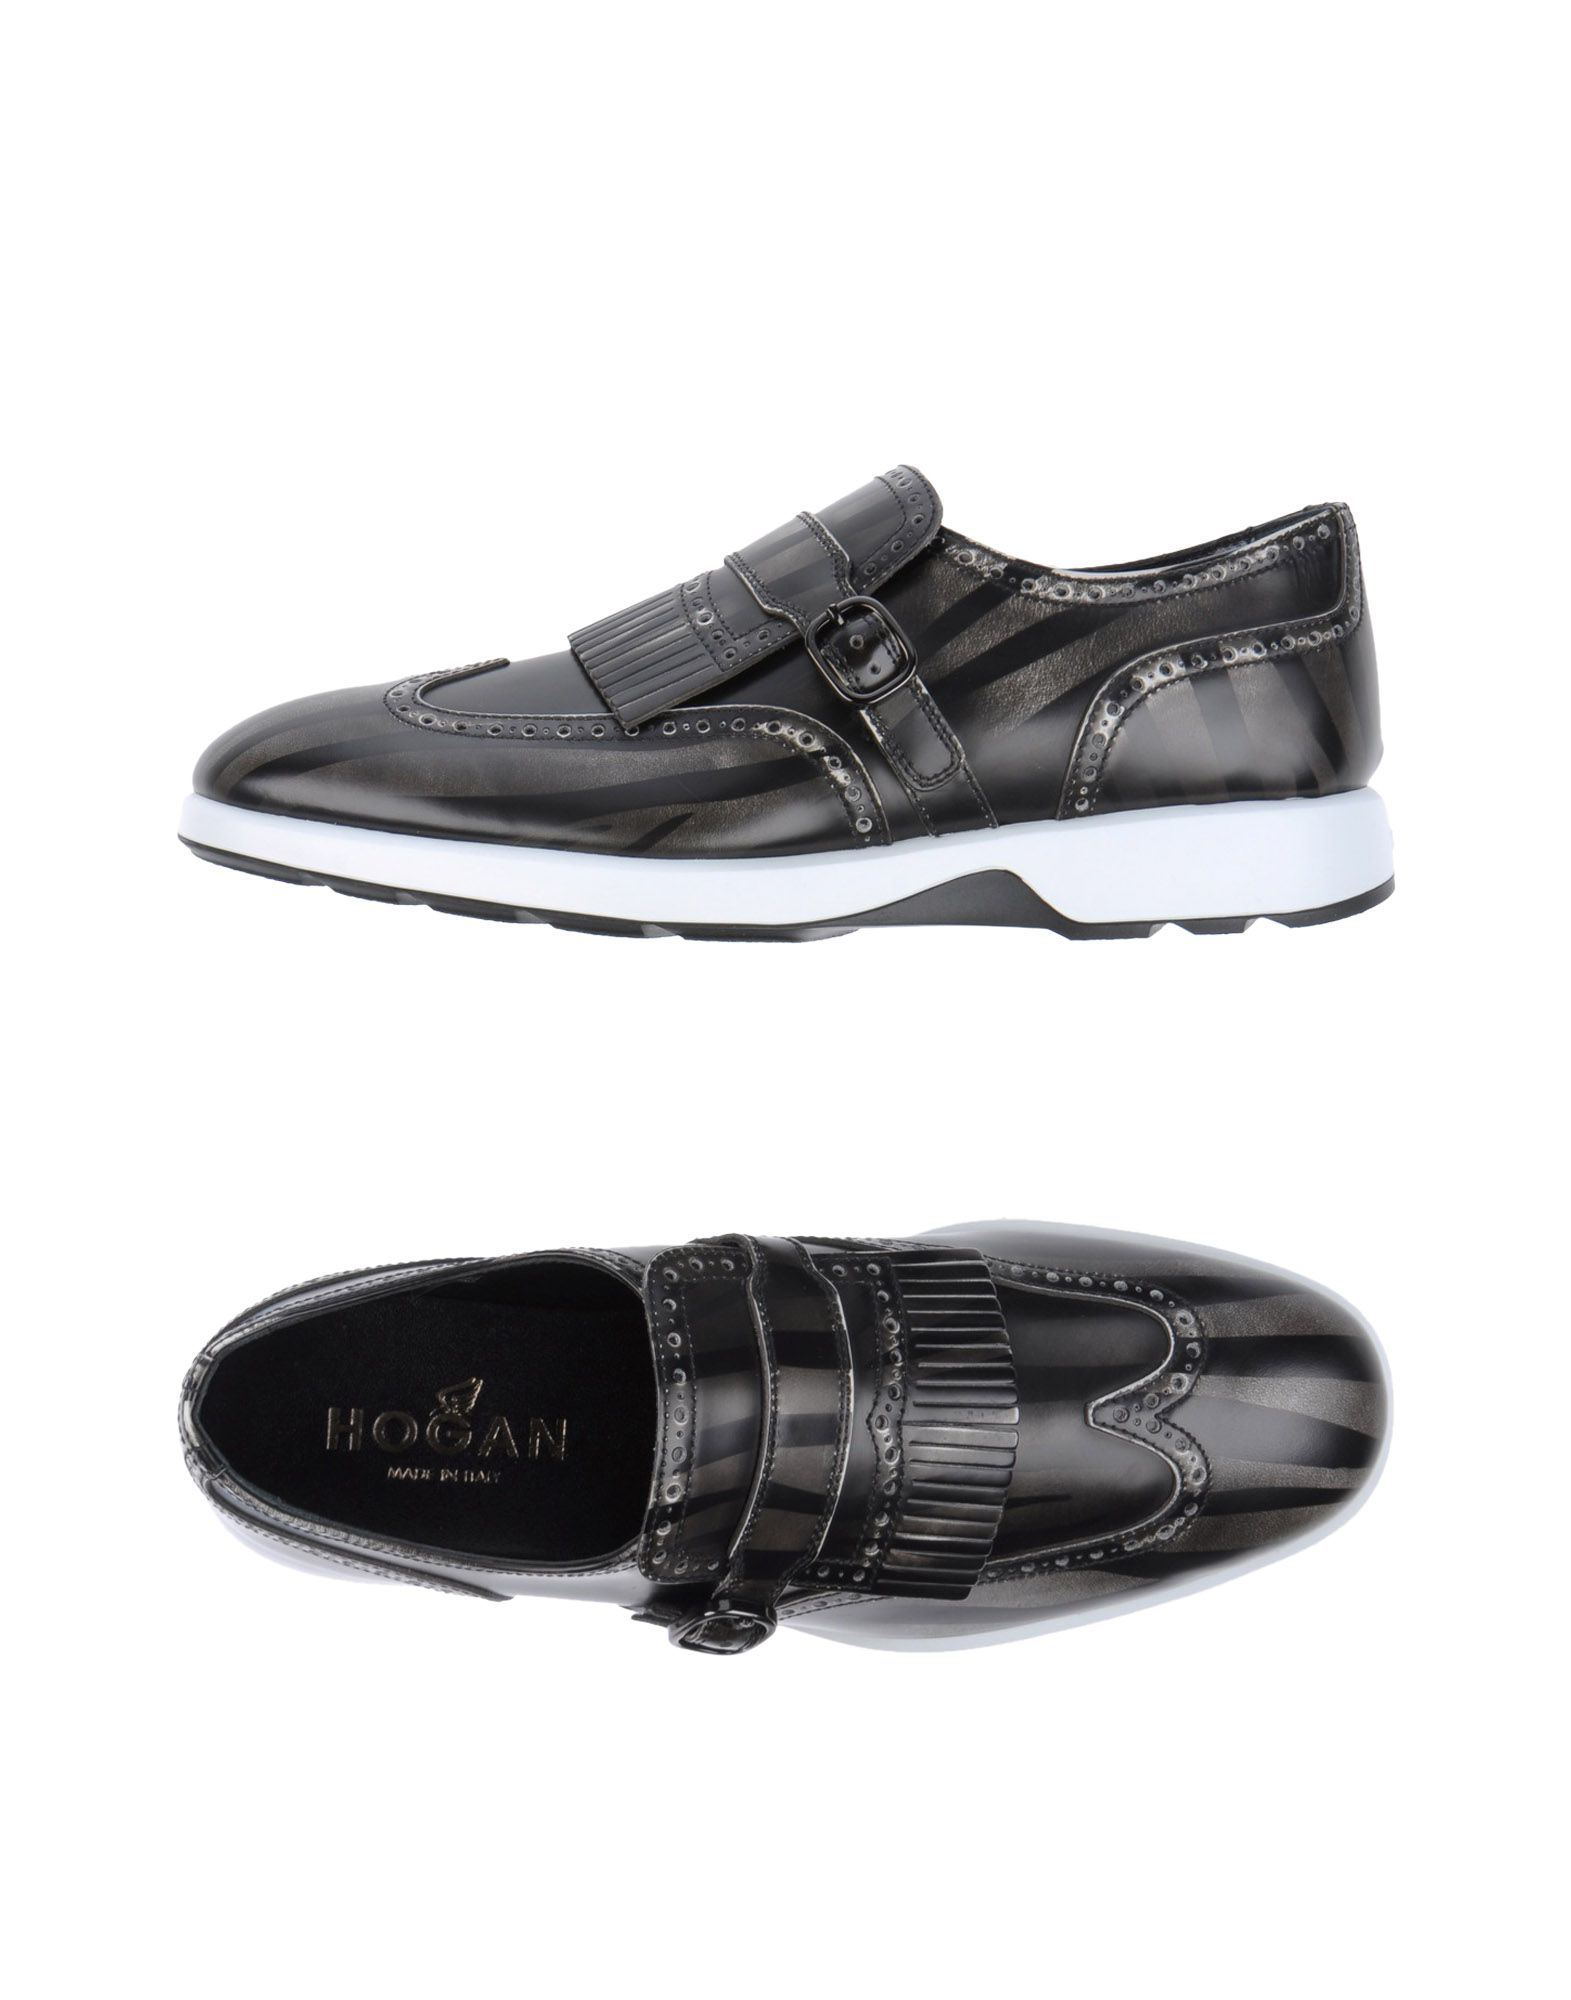 Hogan Mokassins Herren  11174833PC Gute Qualität beliebte Schuhe